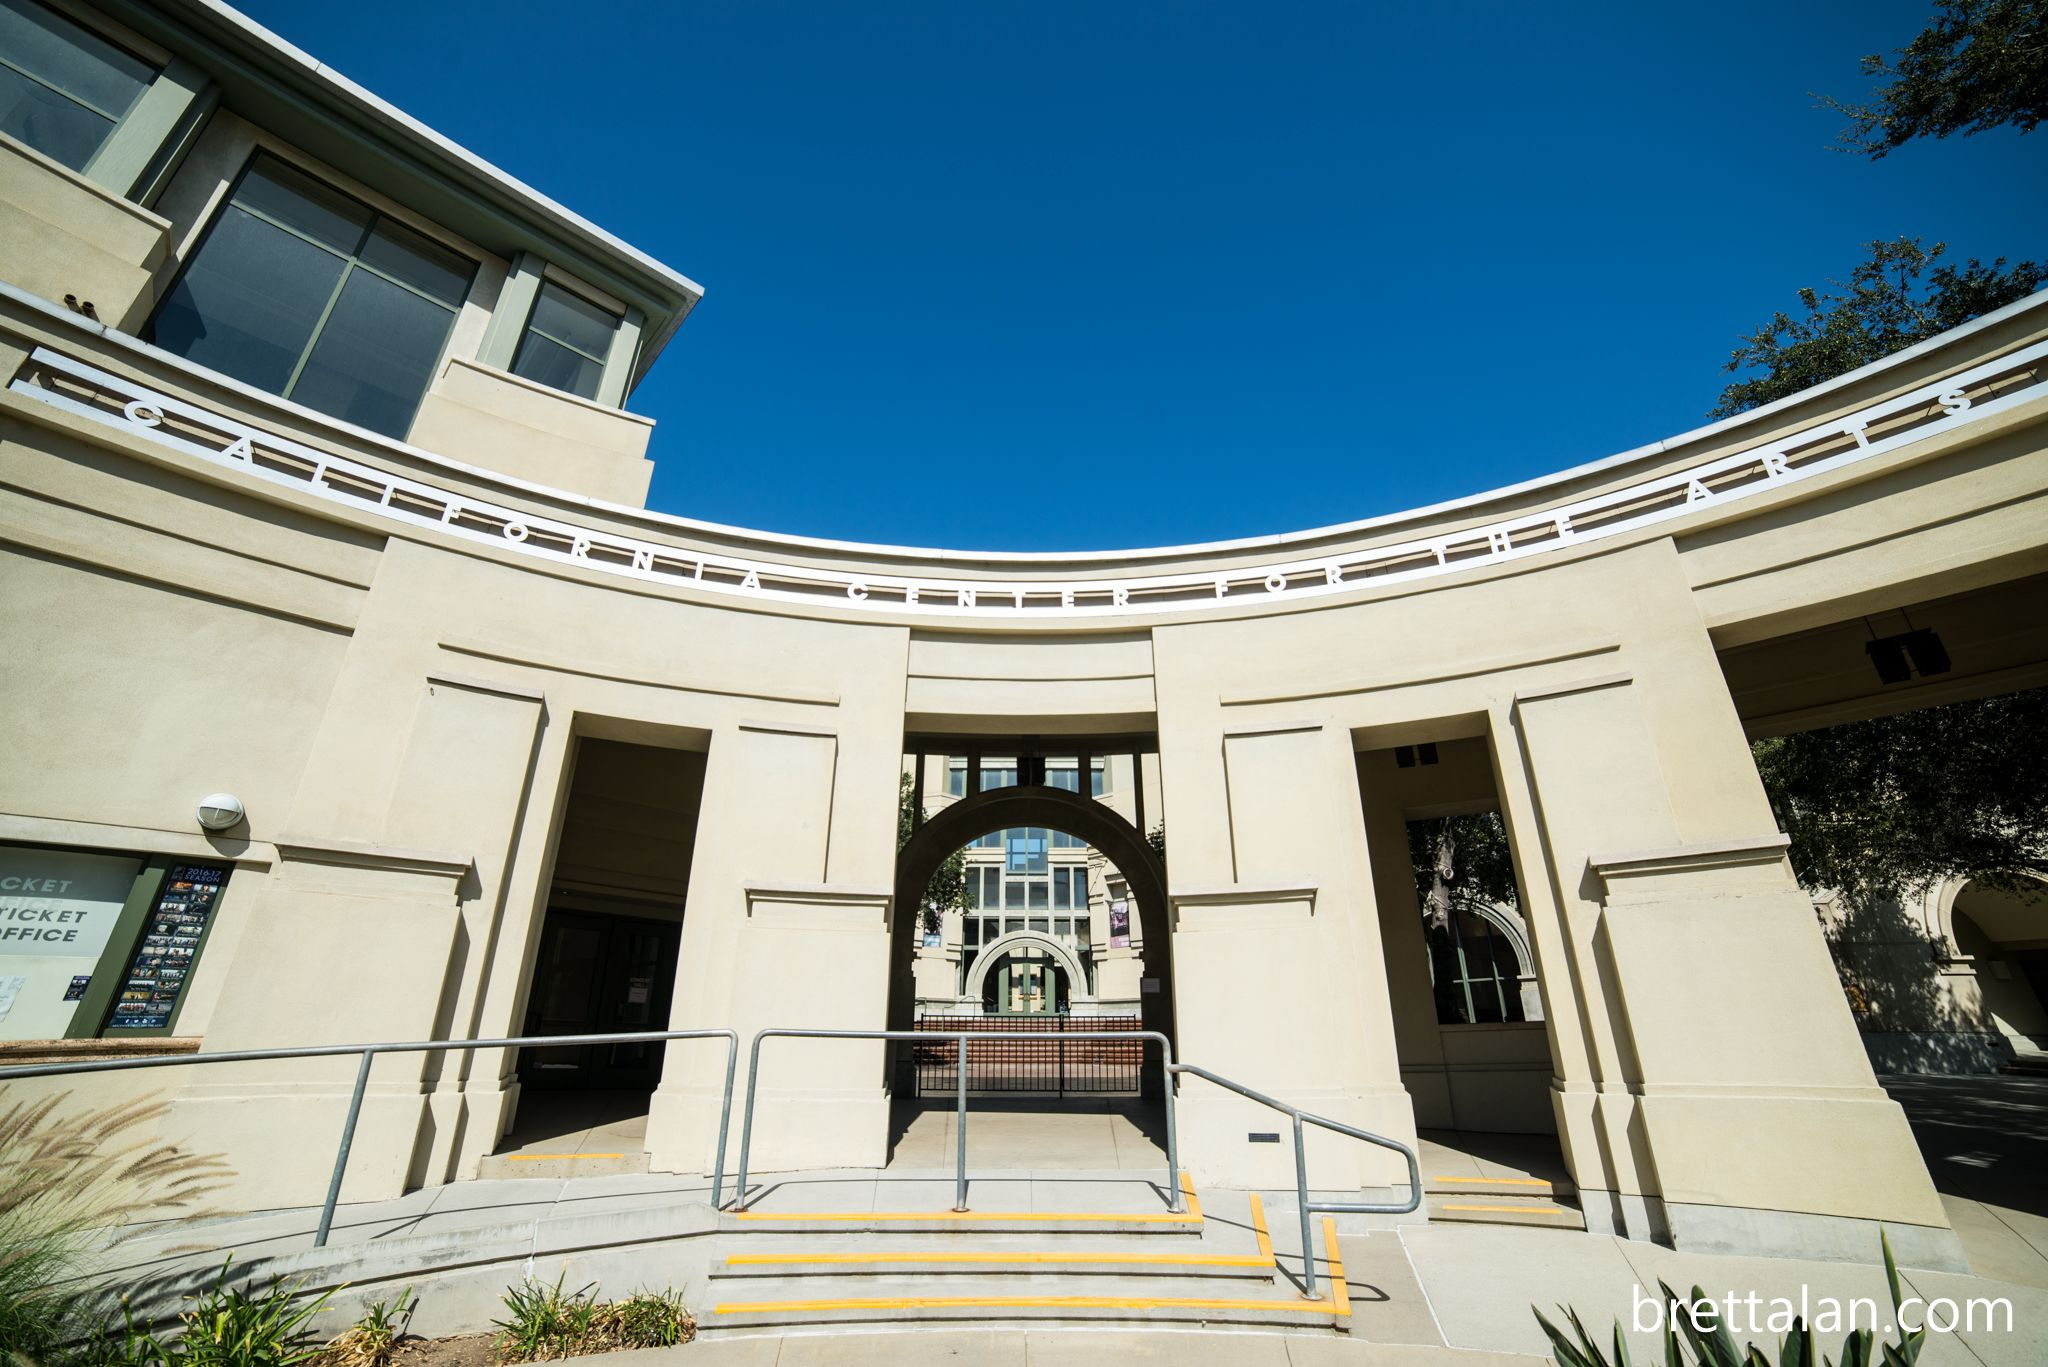 escondido center for the arts free concerts